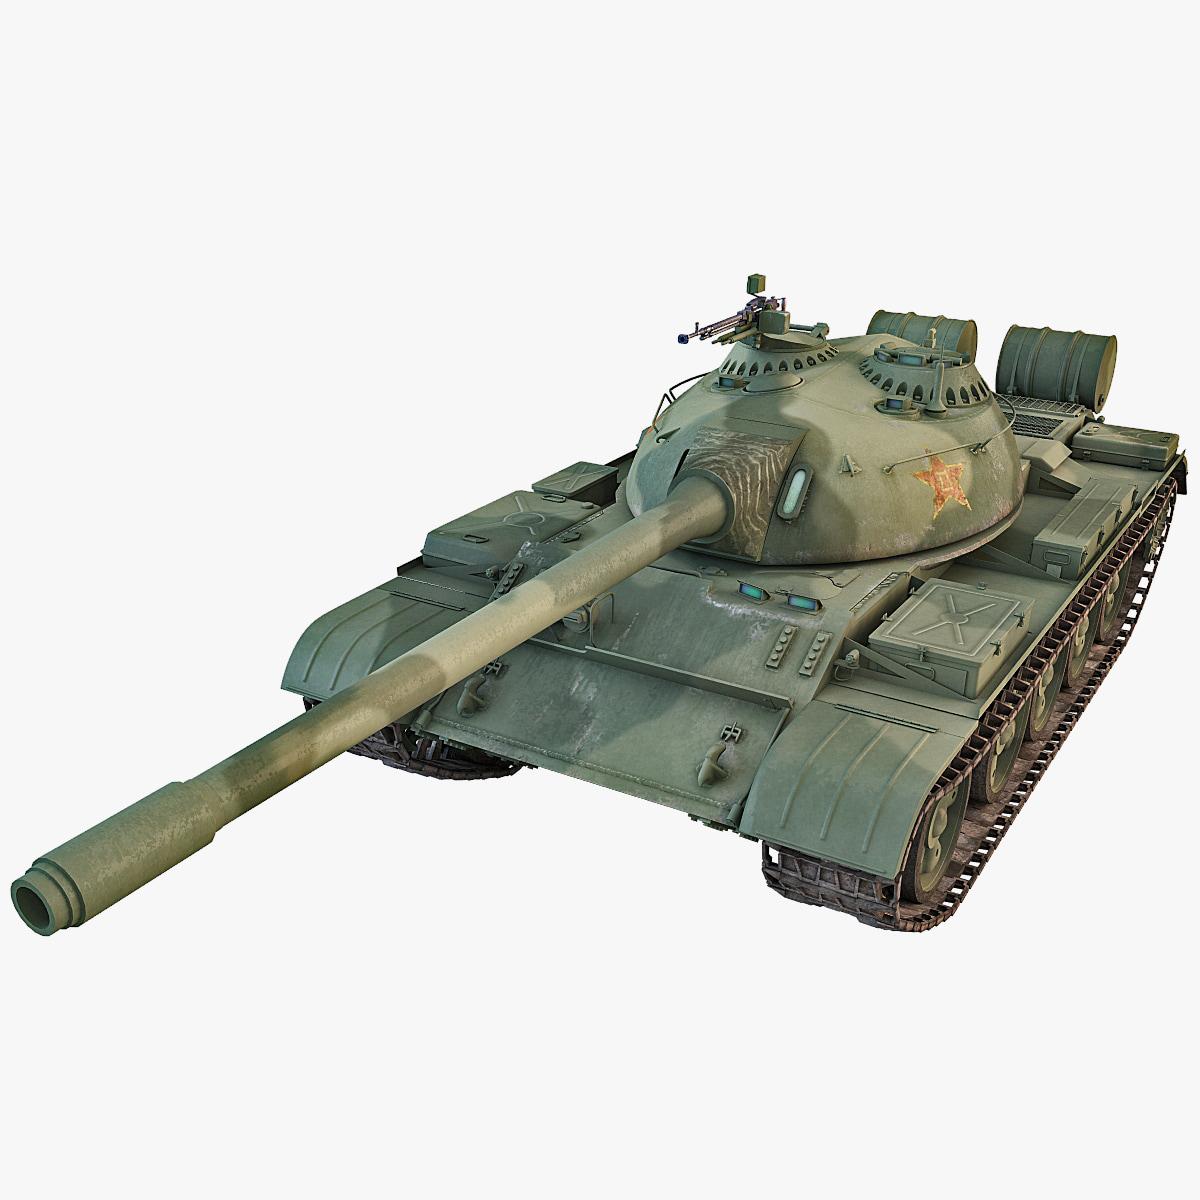 Type_59_China_Main_Battle_Tank_000.jpg